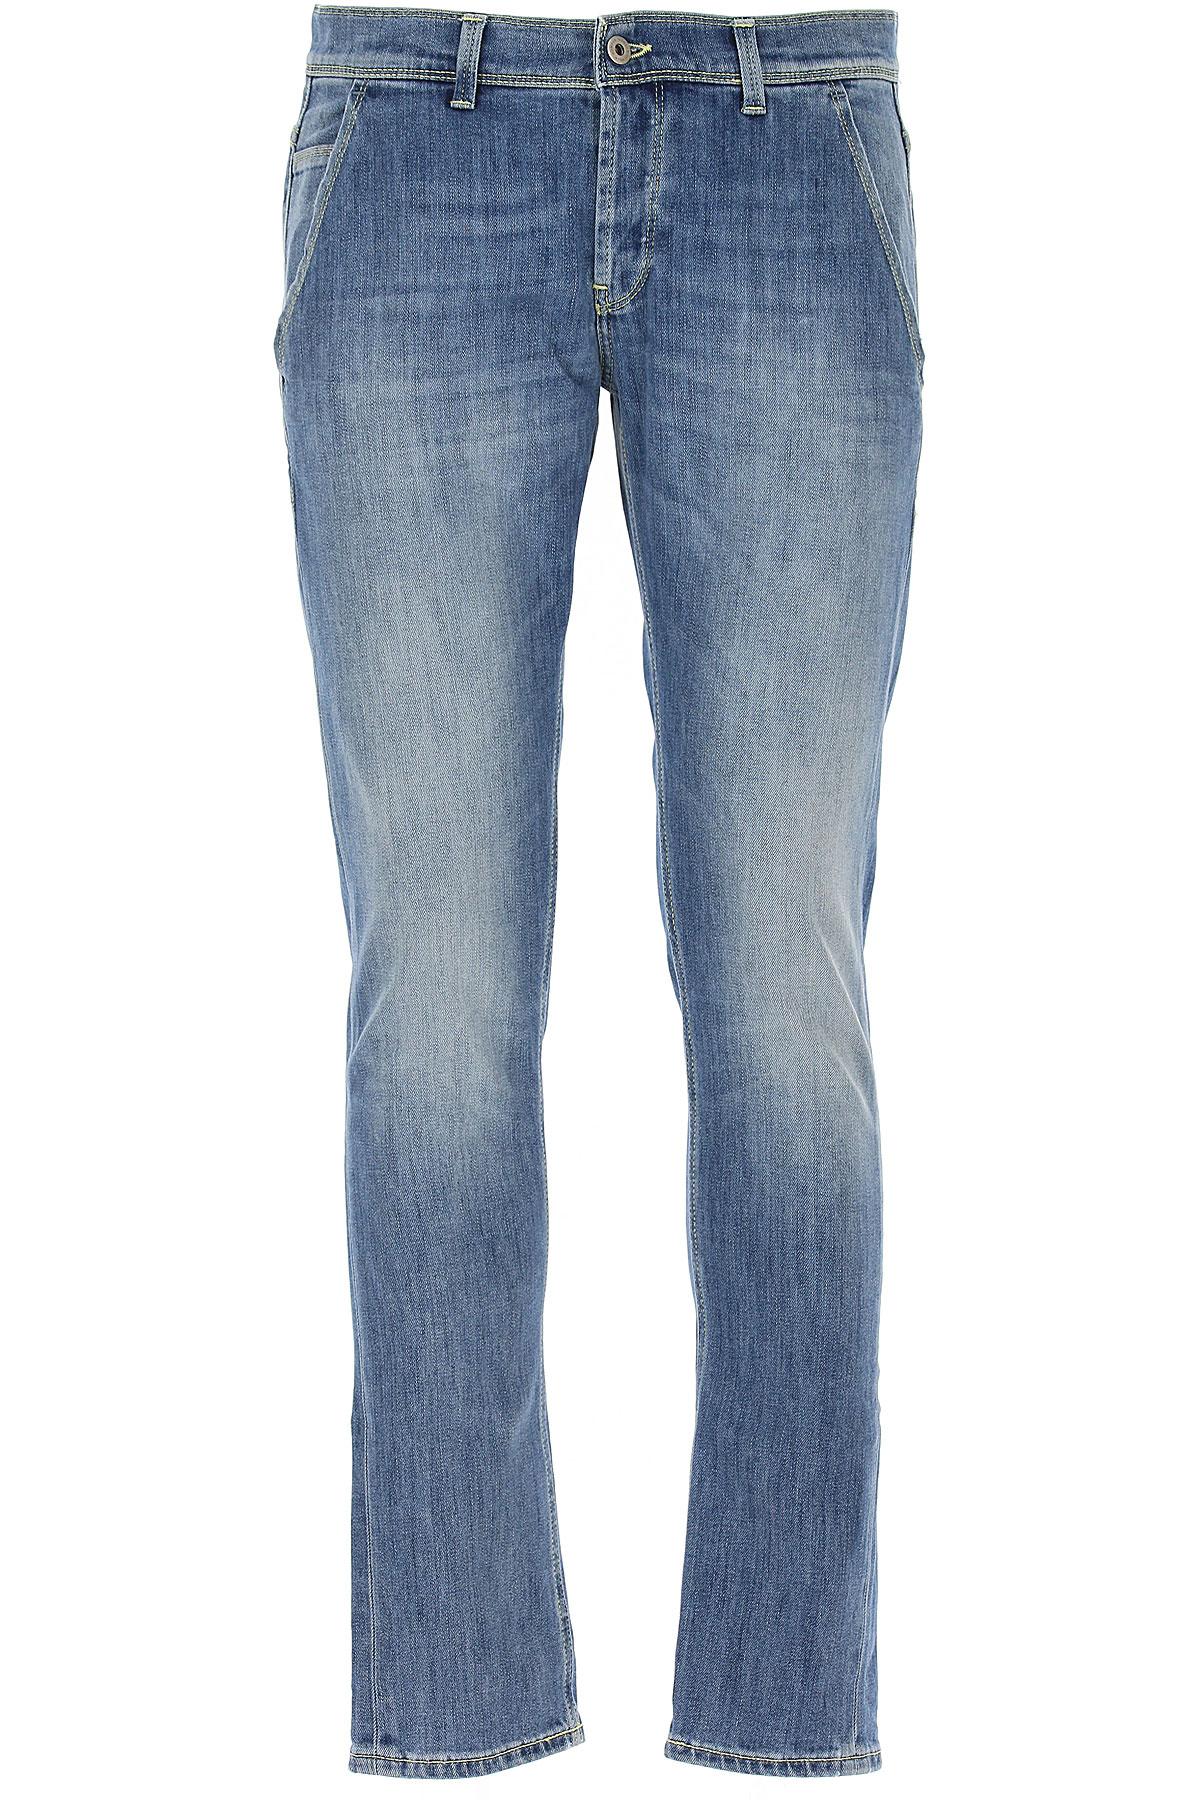 Dondup Jeans, Denim Light, Cotton, 2017, 30 31 33 34 35 36